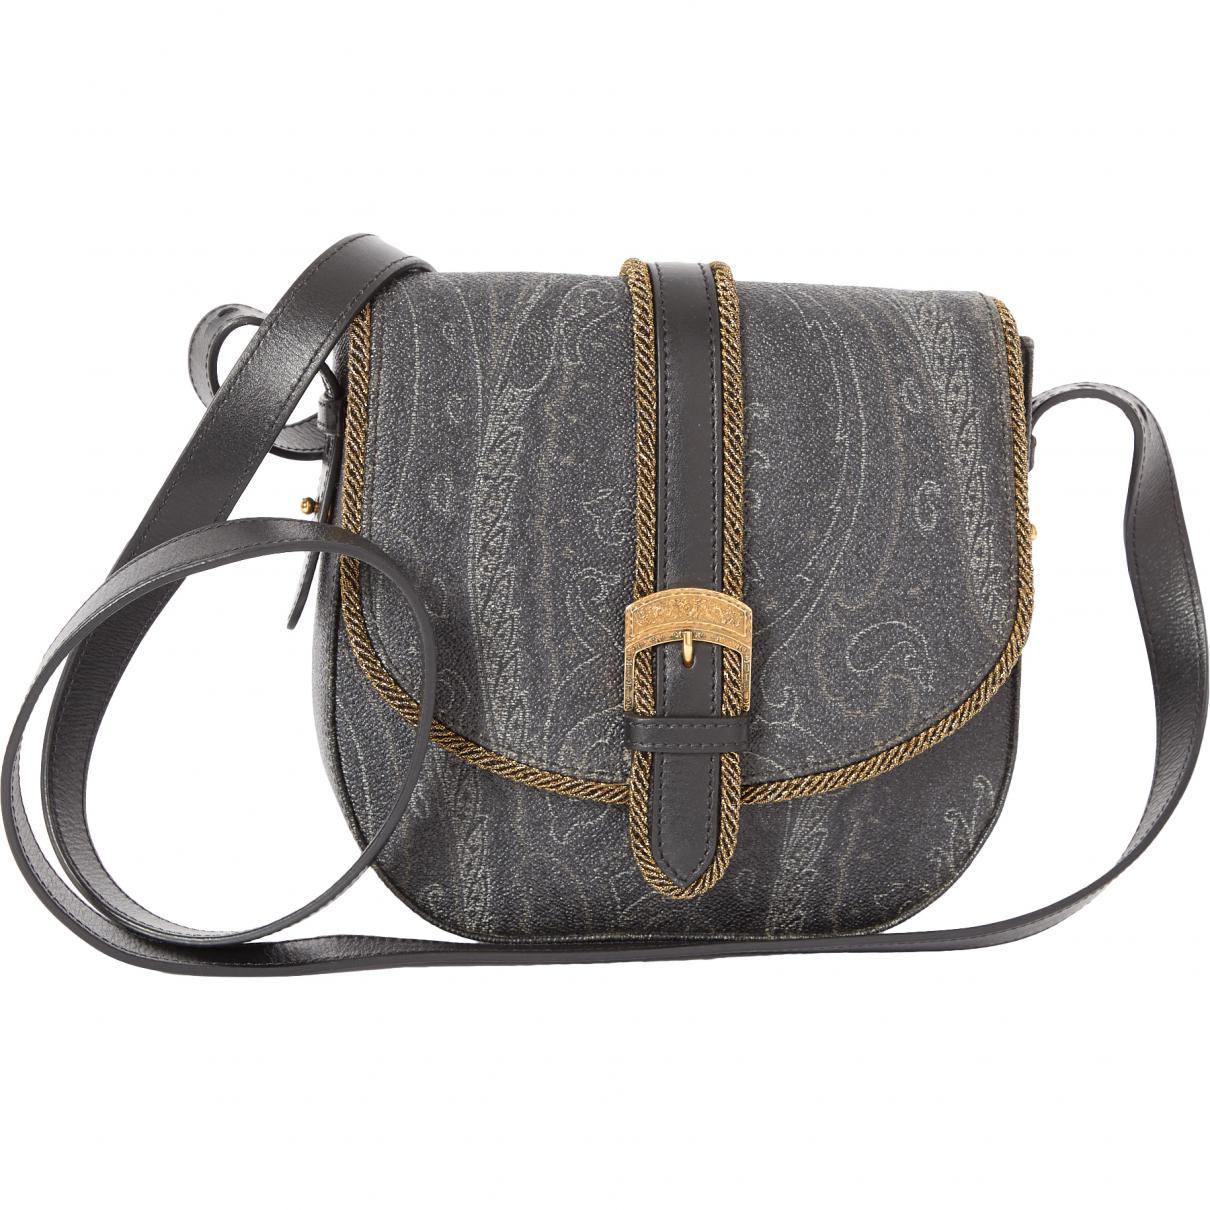 Etro Pre-owned - Leather mini bag MwtS5ClCJ